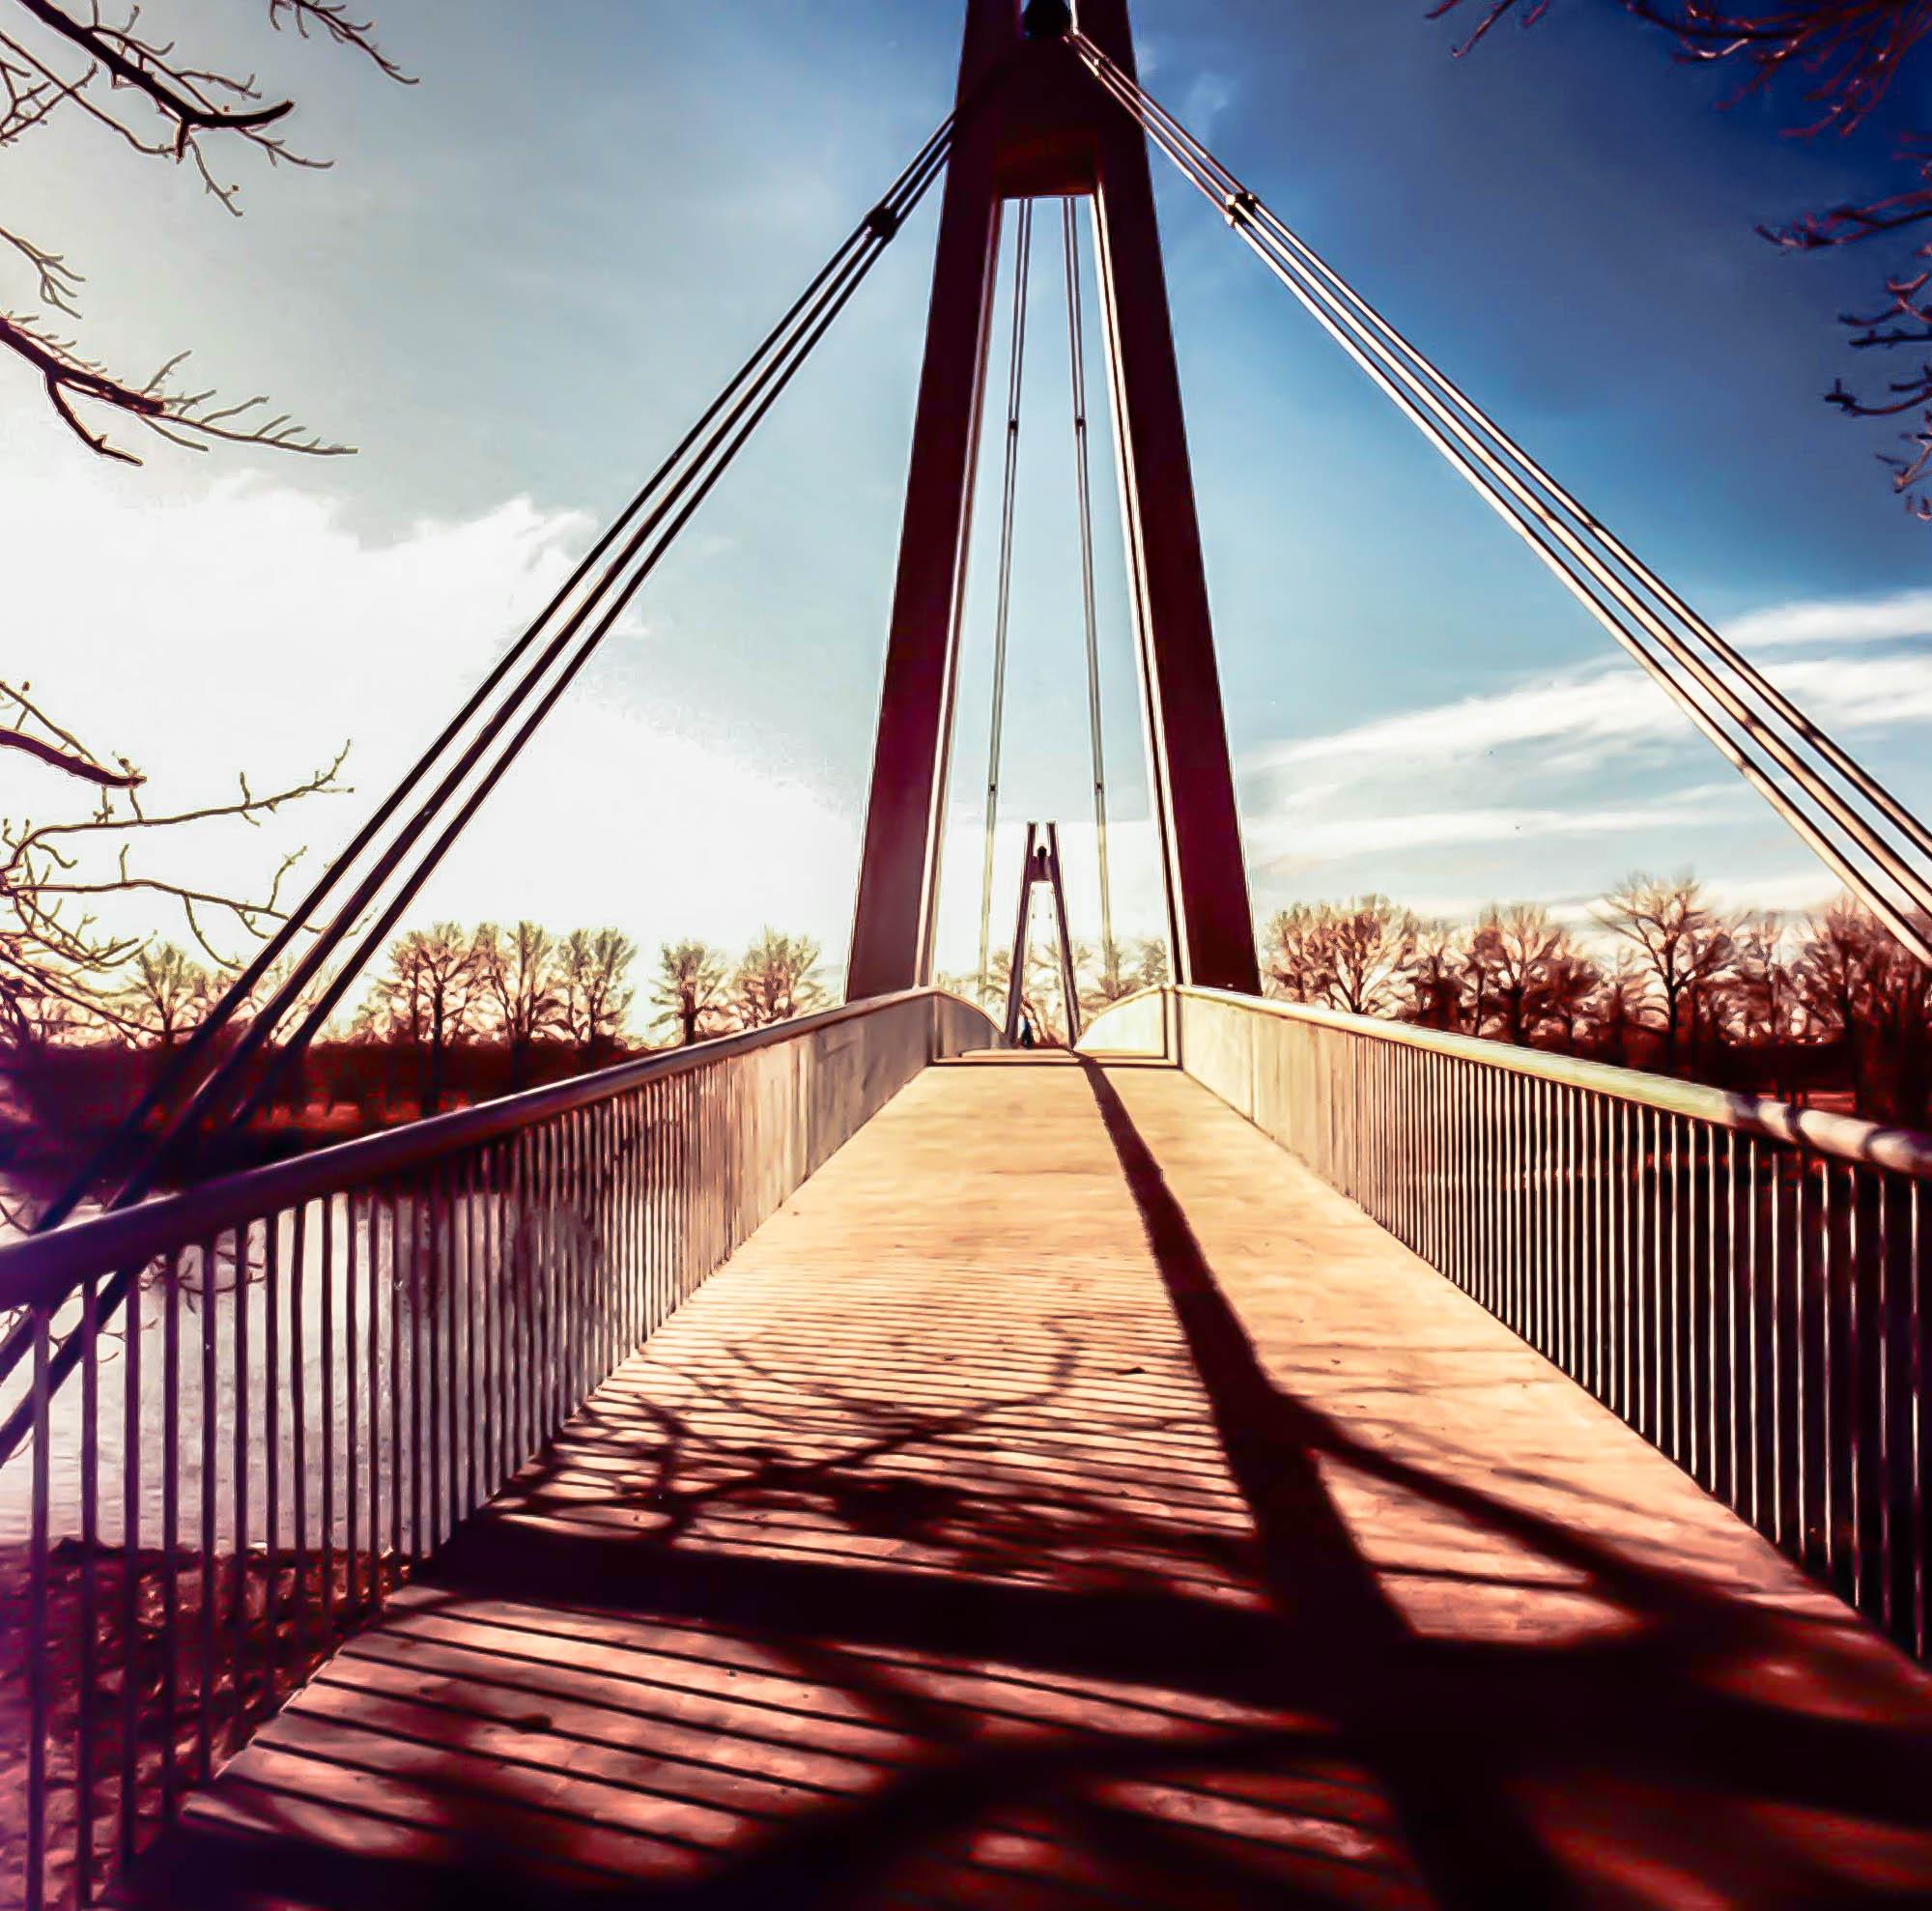 Carburn-Park-Bridge-2_small.jpg